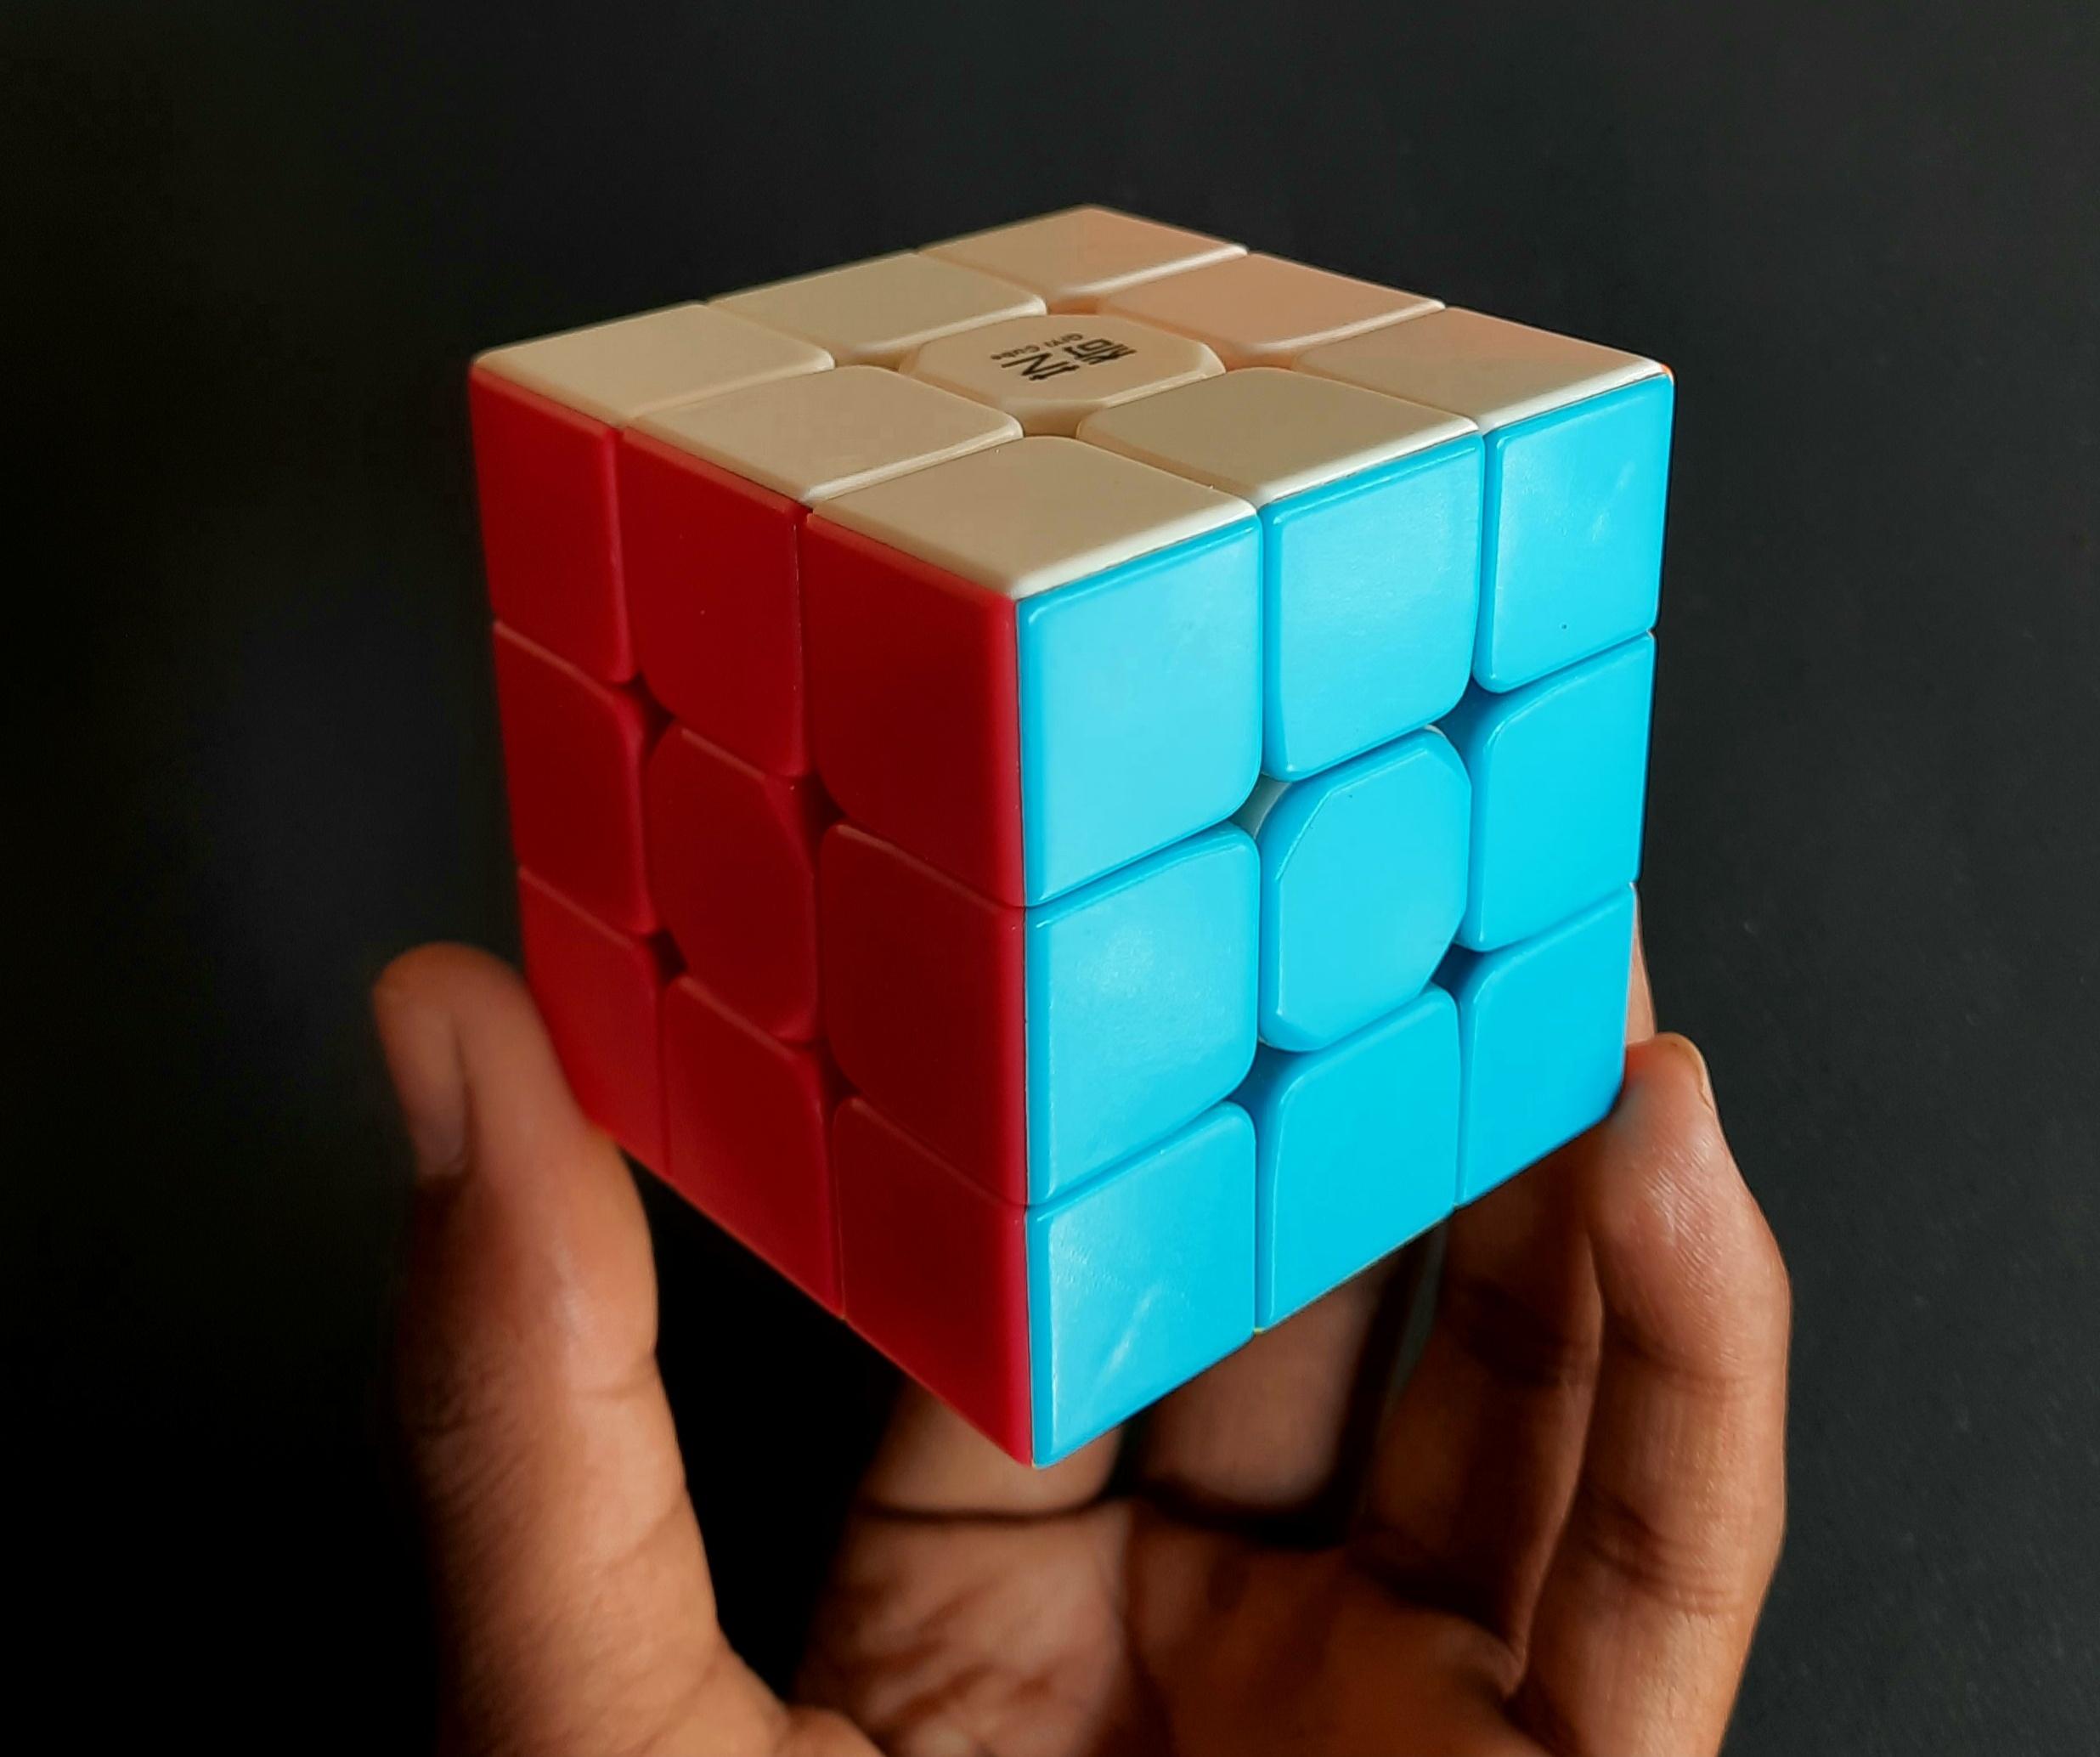 rubik's cube in hand